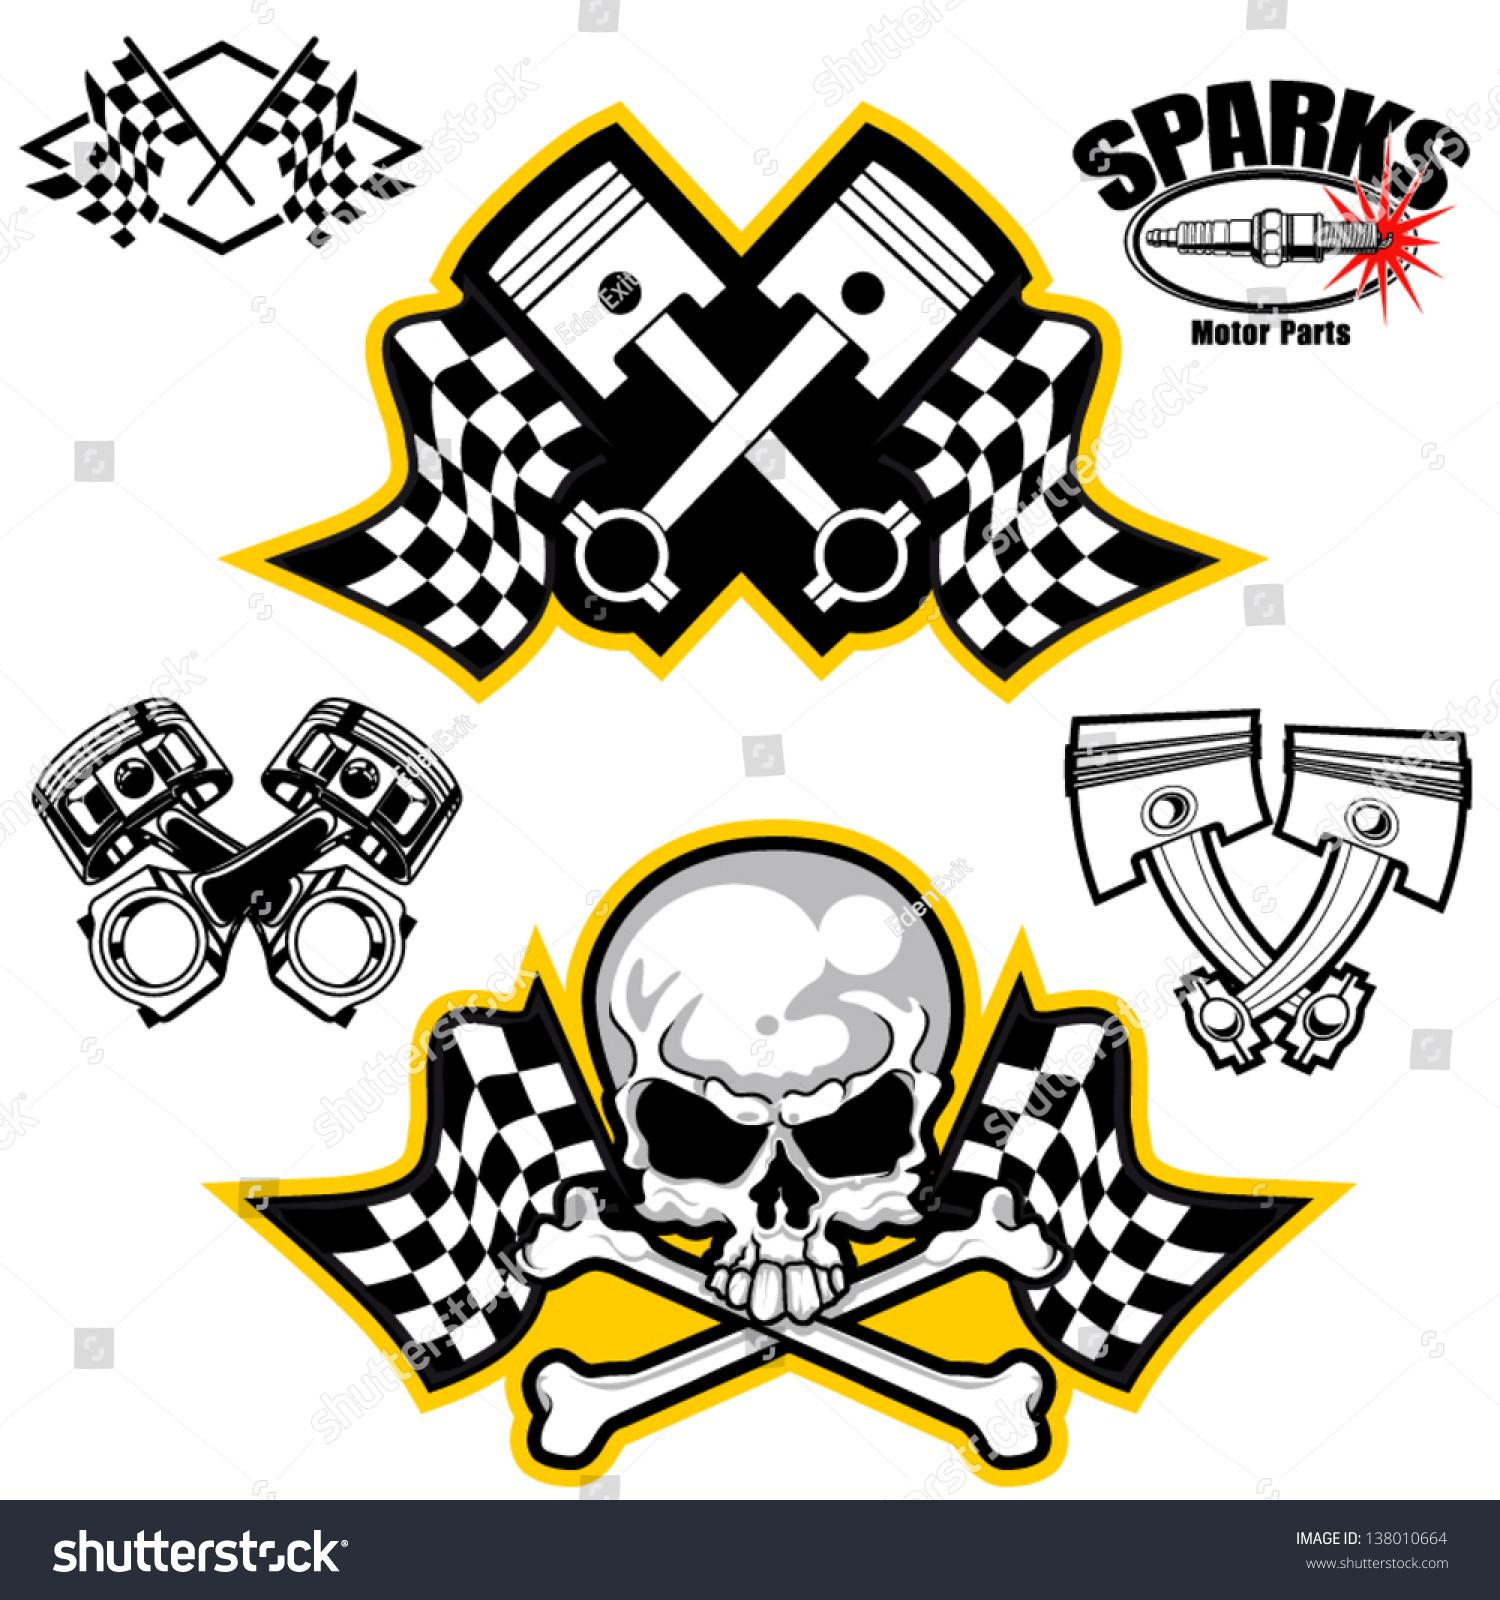 Vector Illustration Car Racing Symbols Stock Vector 2018 138010664